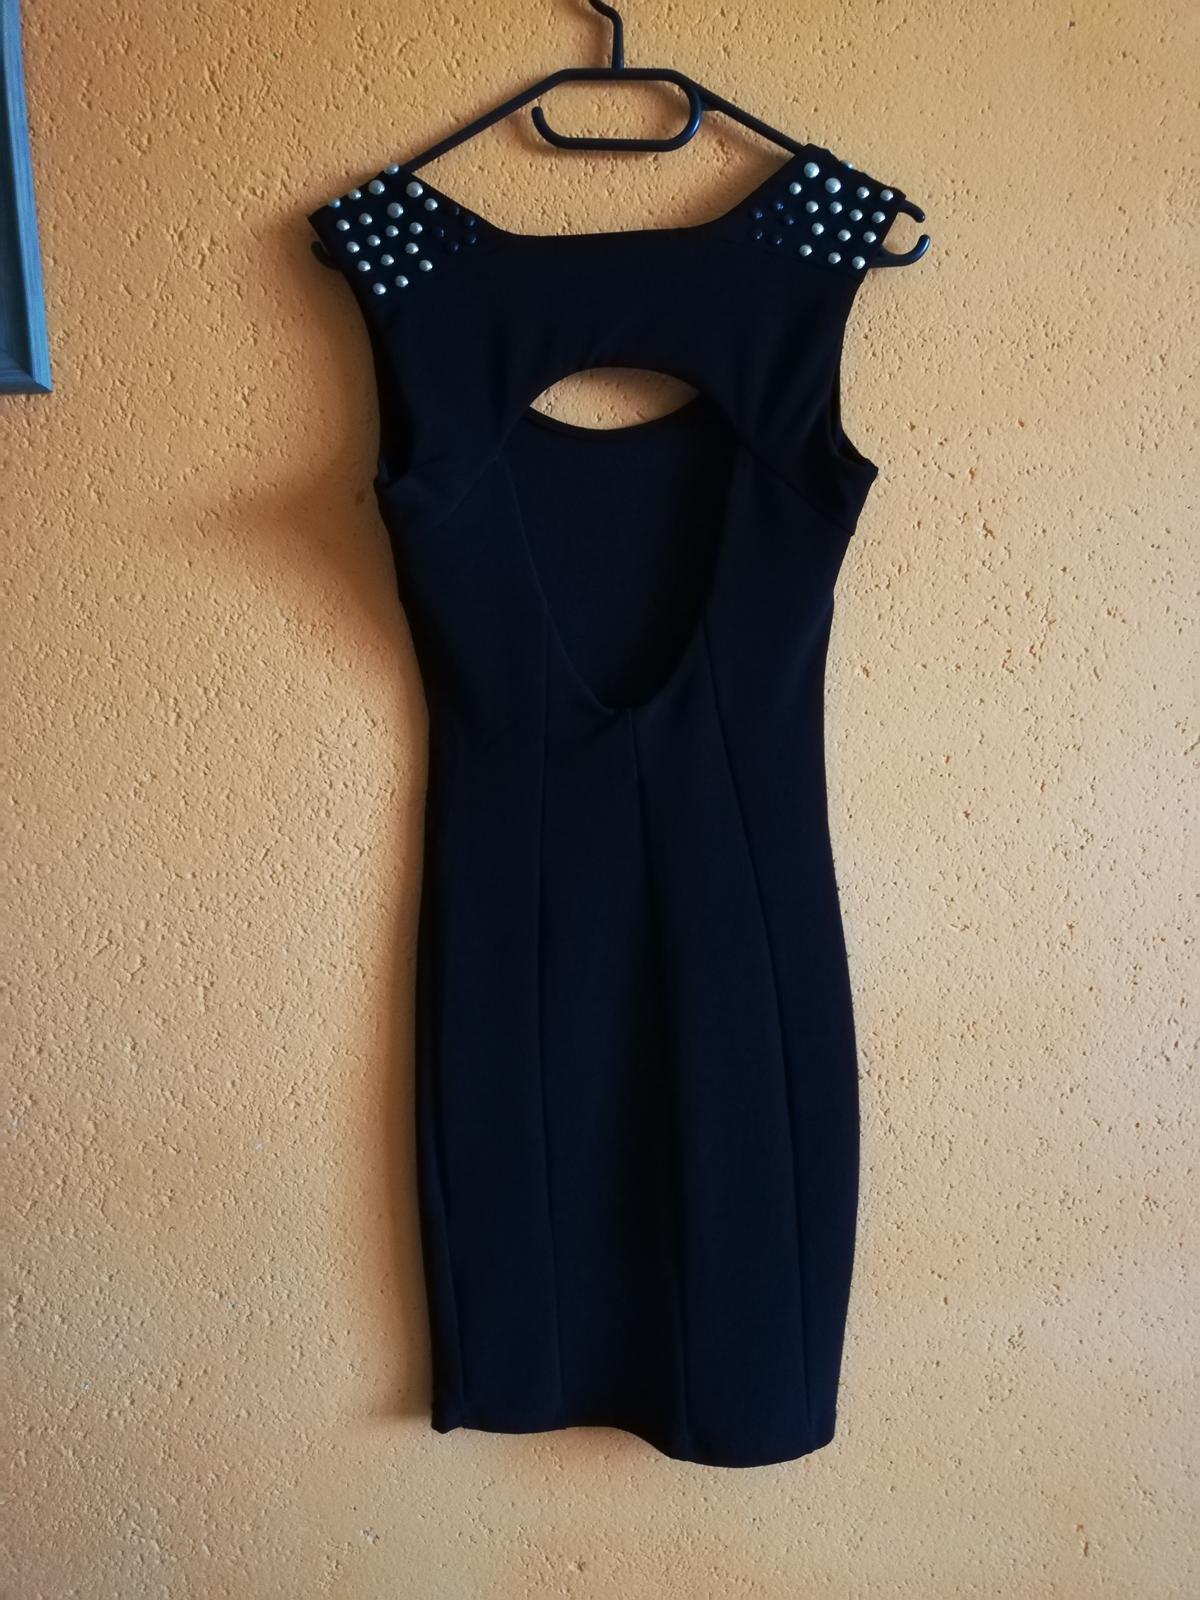 Čierne šaty 34-38 - Obrázok č. 3